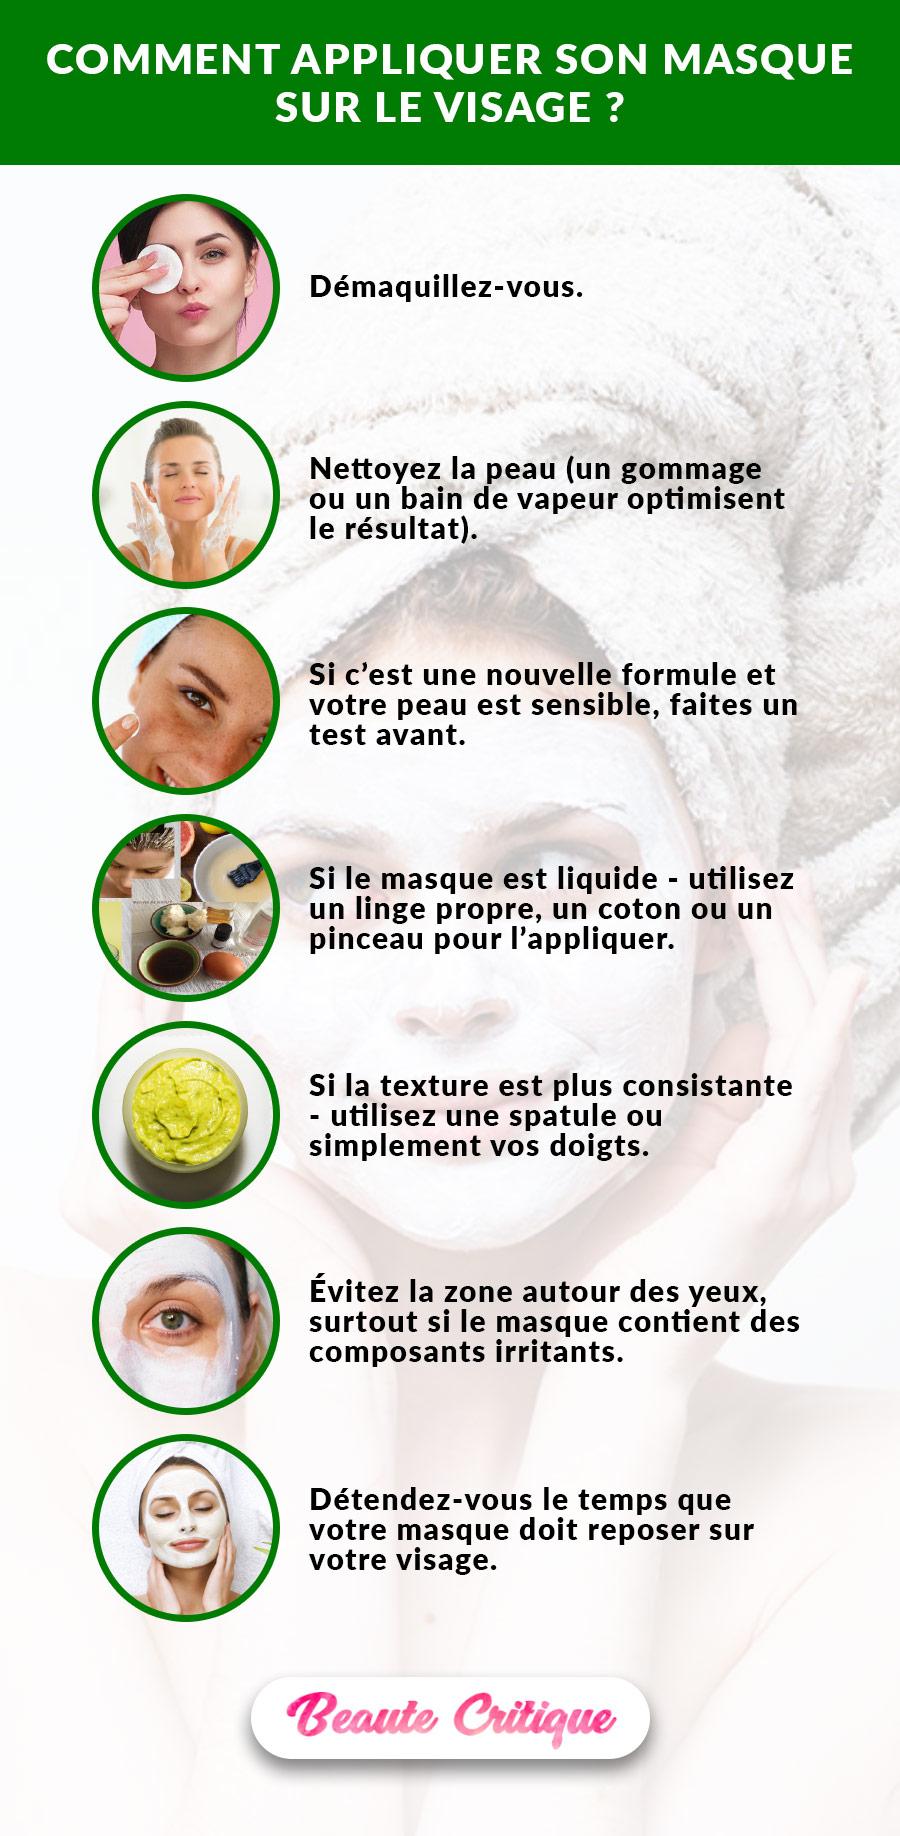 appliquer masque sur visage